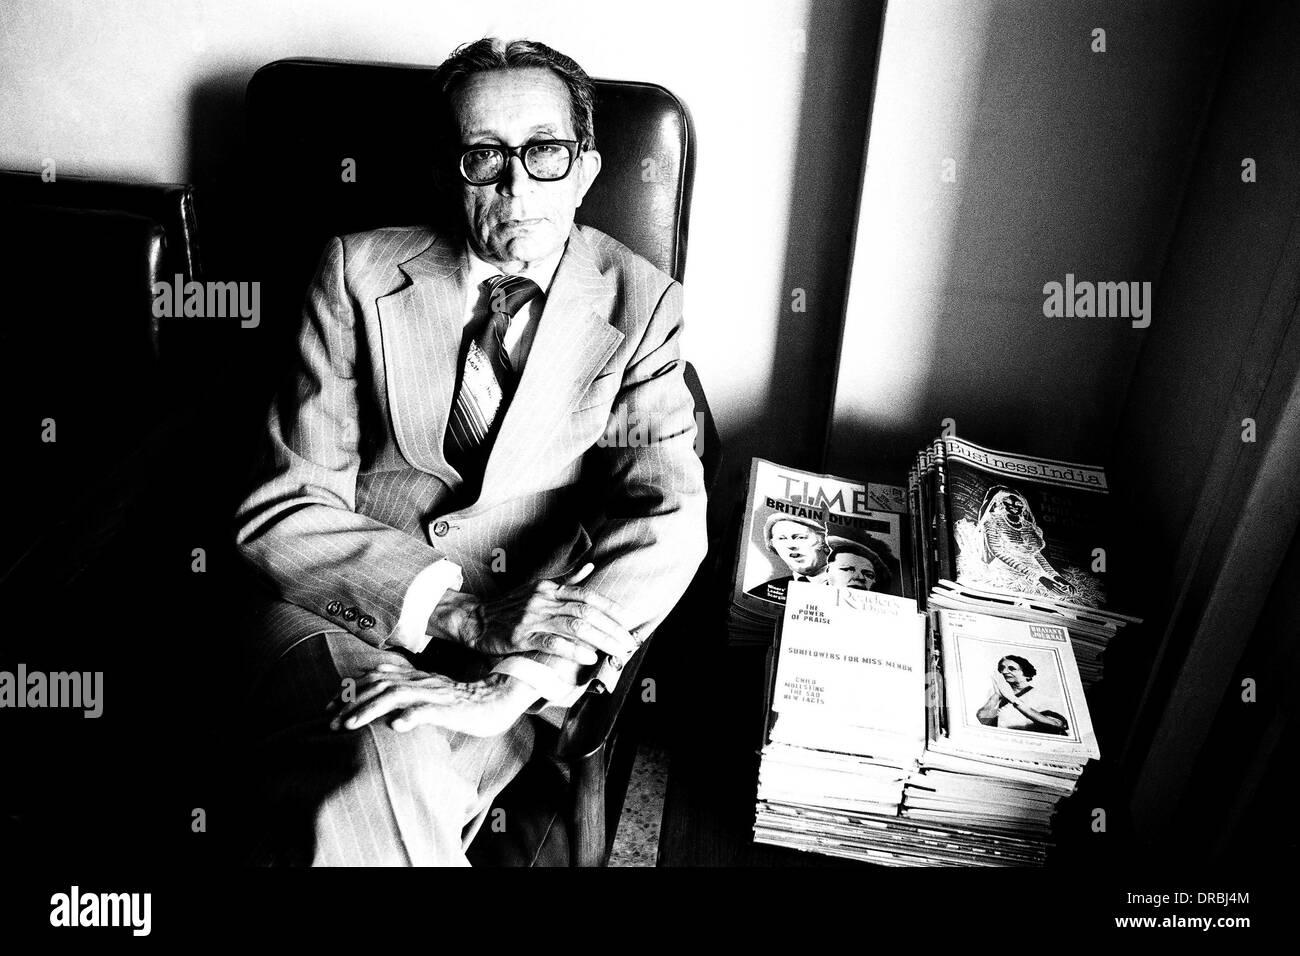 PSI President Dilhar Bhacheh, Mumbai, Maharashtra, India, 1984 - Stock Image